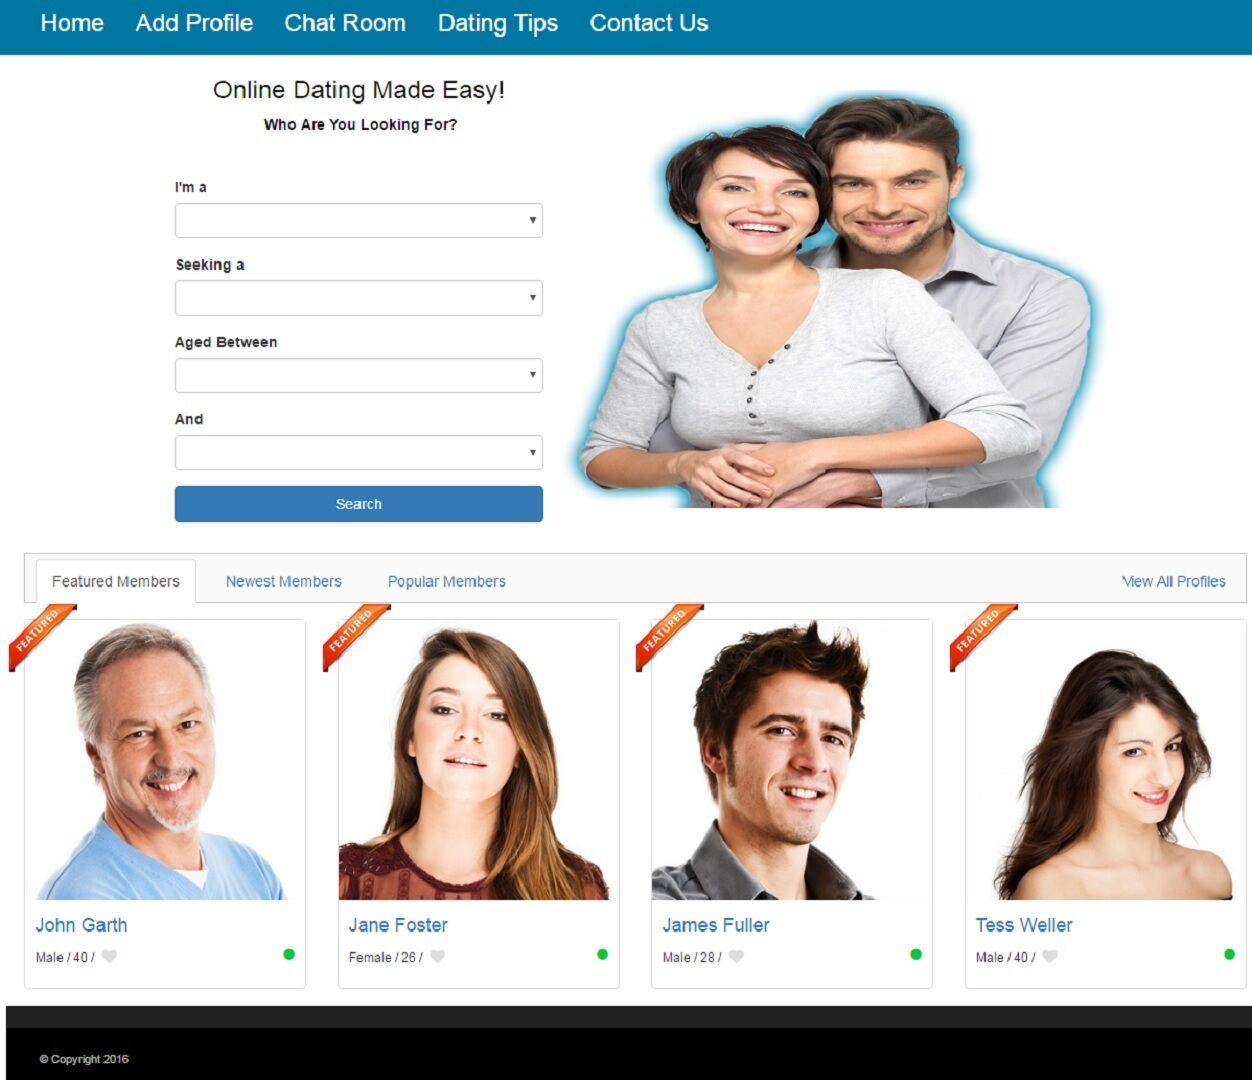 DATING SERVICE WEBSITE BUSINESS FOR SALE! MOBILE FRIENDLY DESIGN